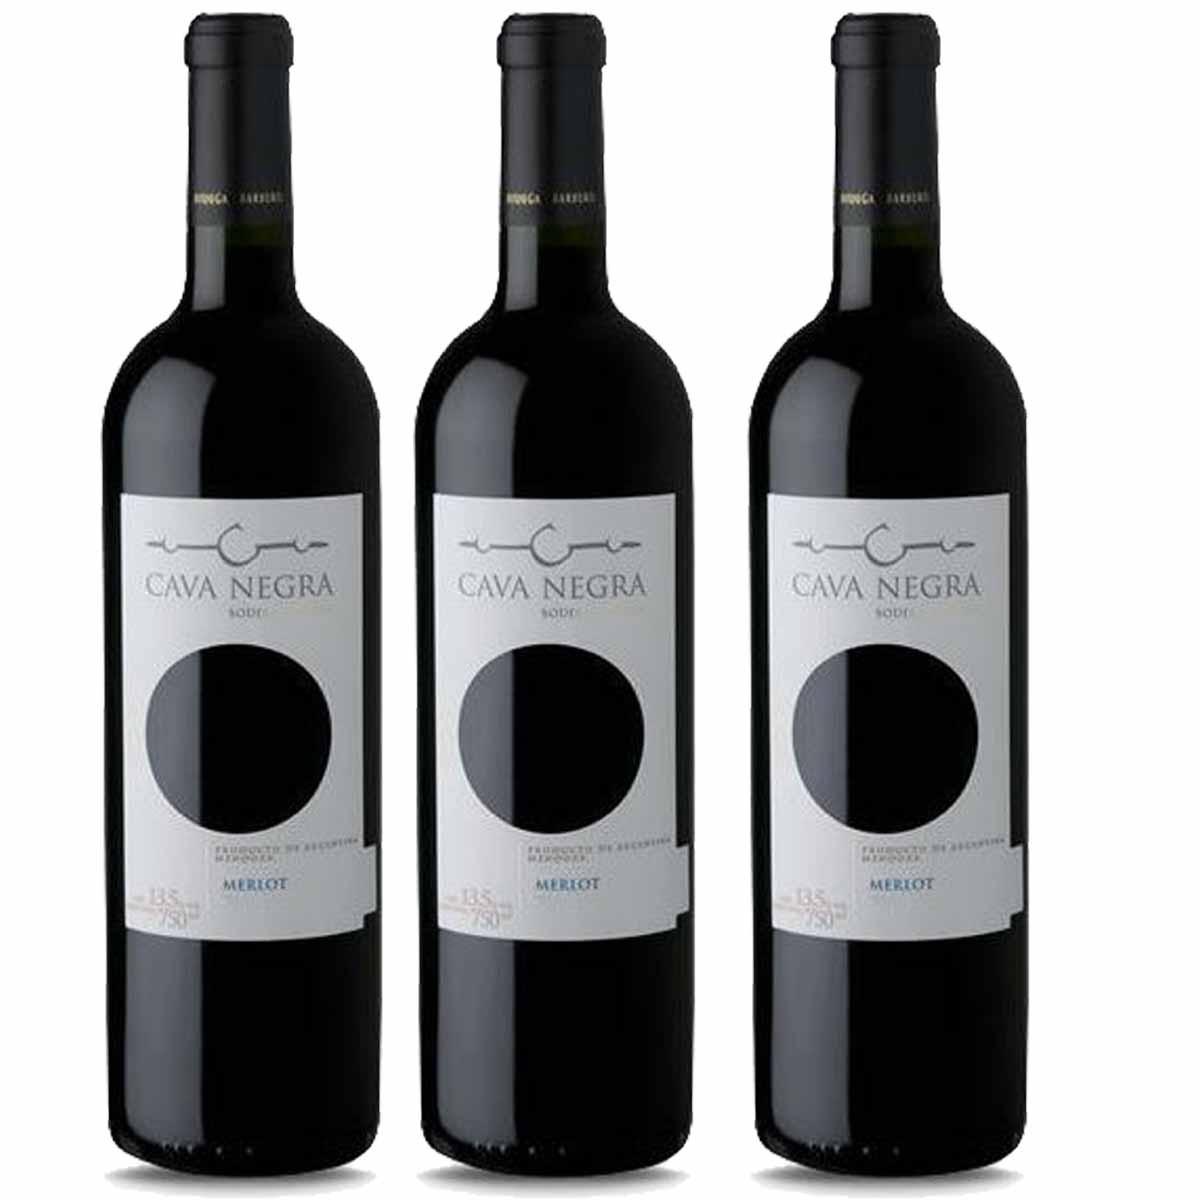 Kit 3x Vinho Tinto Argentino Cava Negra Merlot 2019